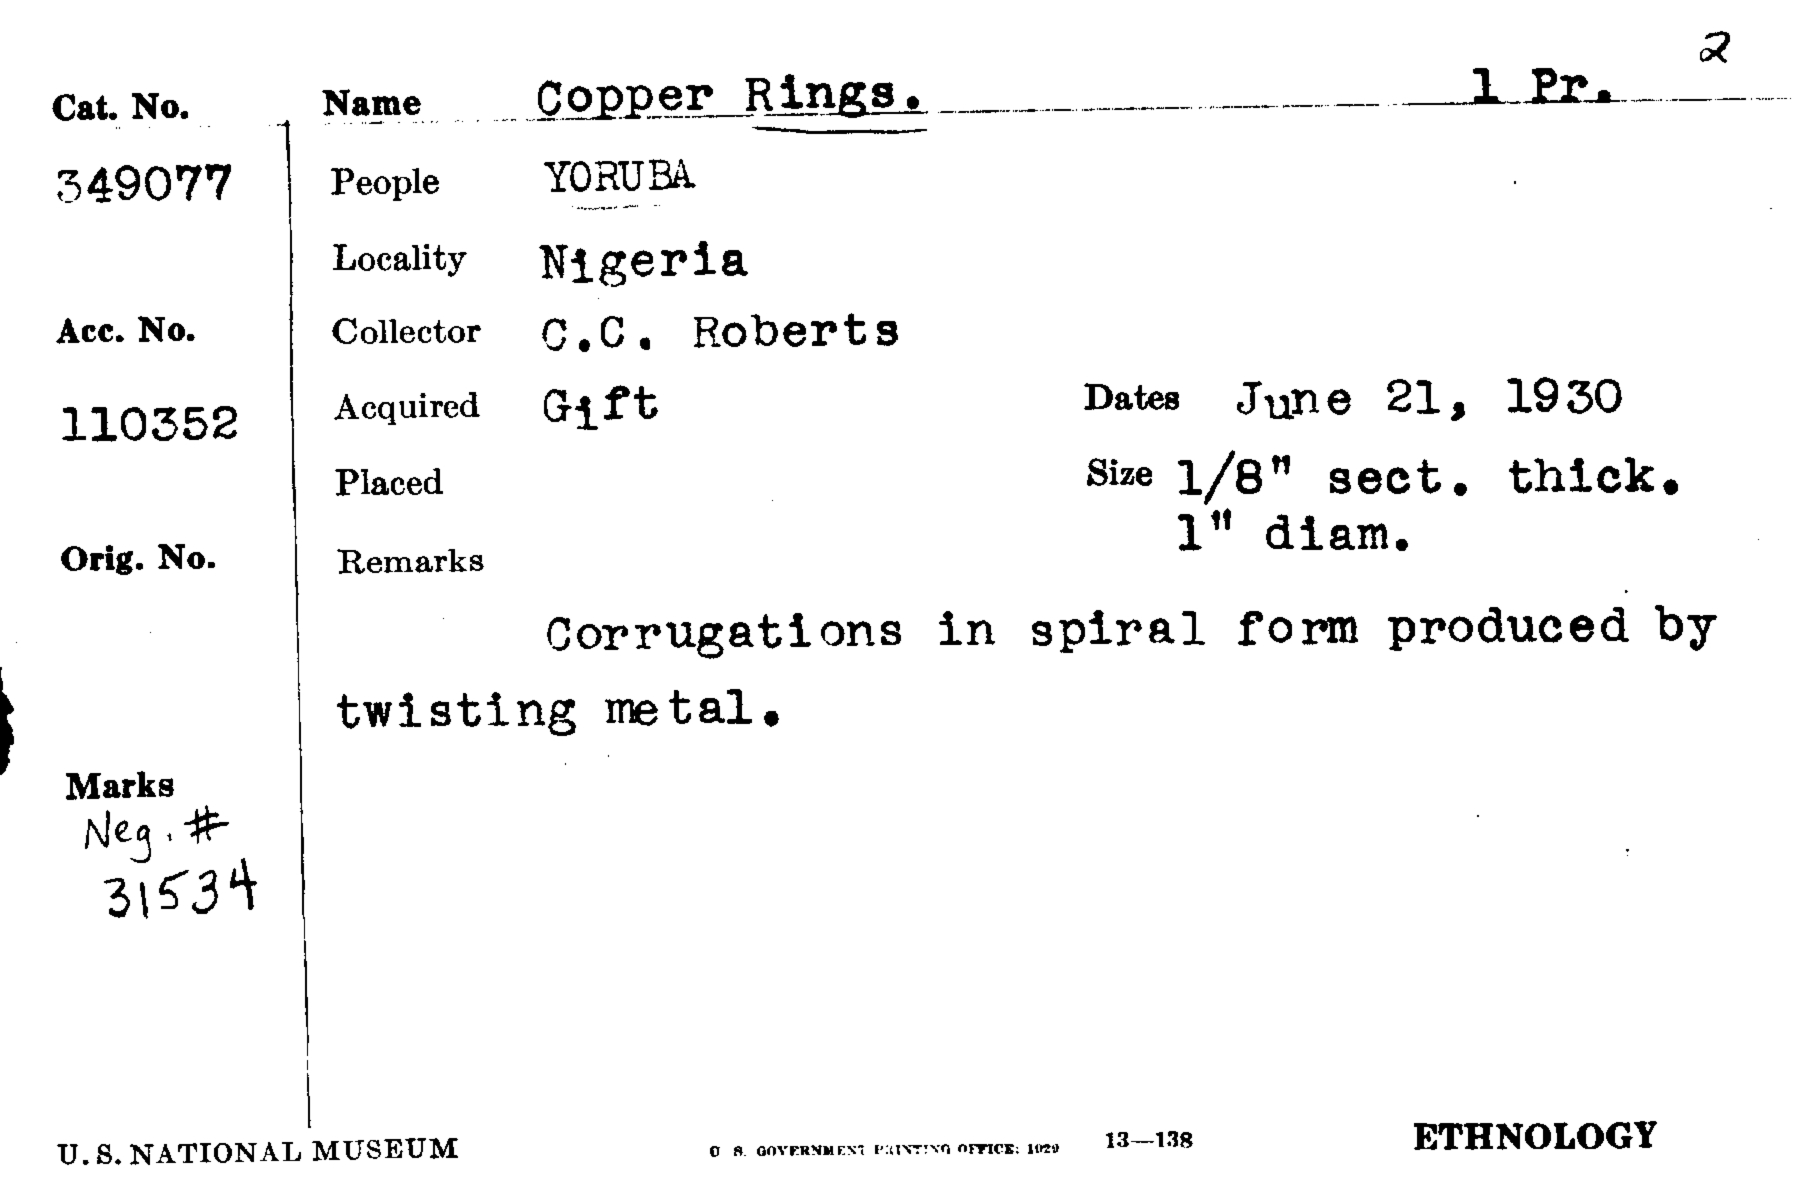 Copper Rings (1 Pair)